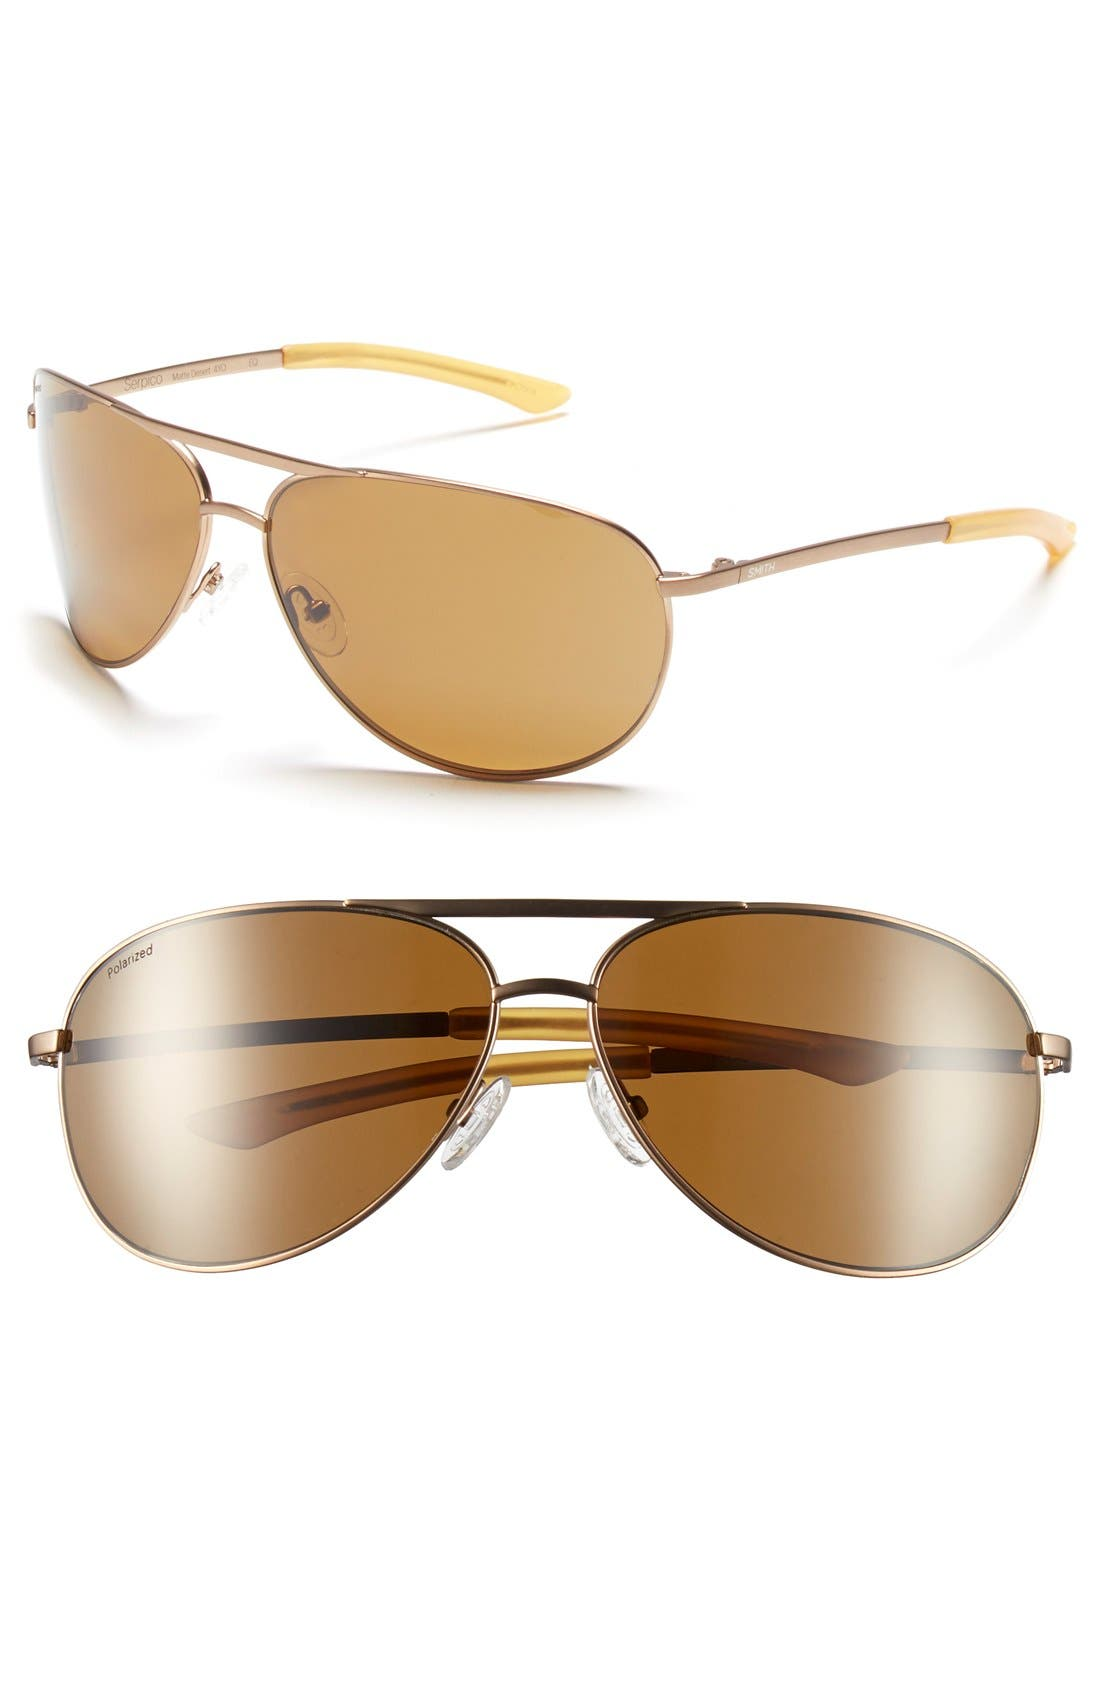 Main Image - Smith Optics 'Serpico' 66mm Polarized Sunglasses